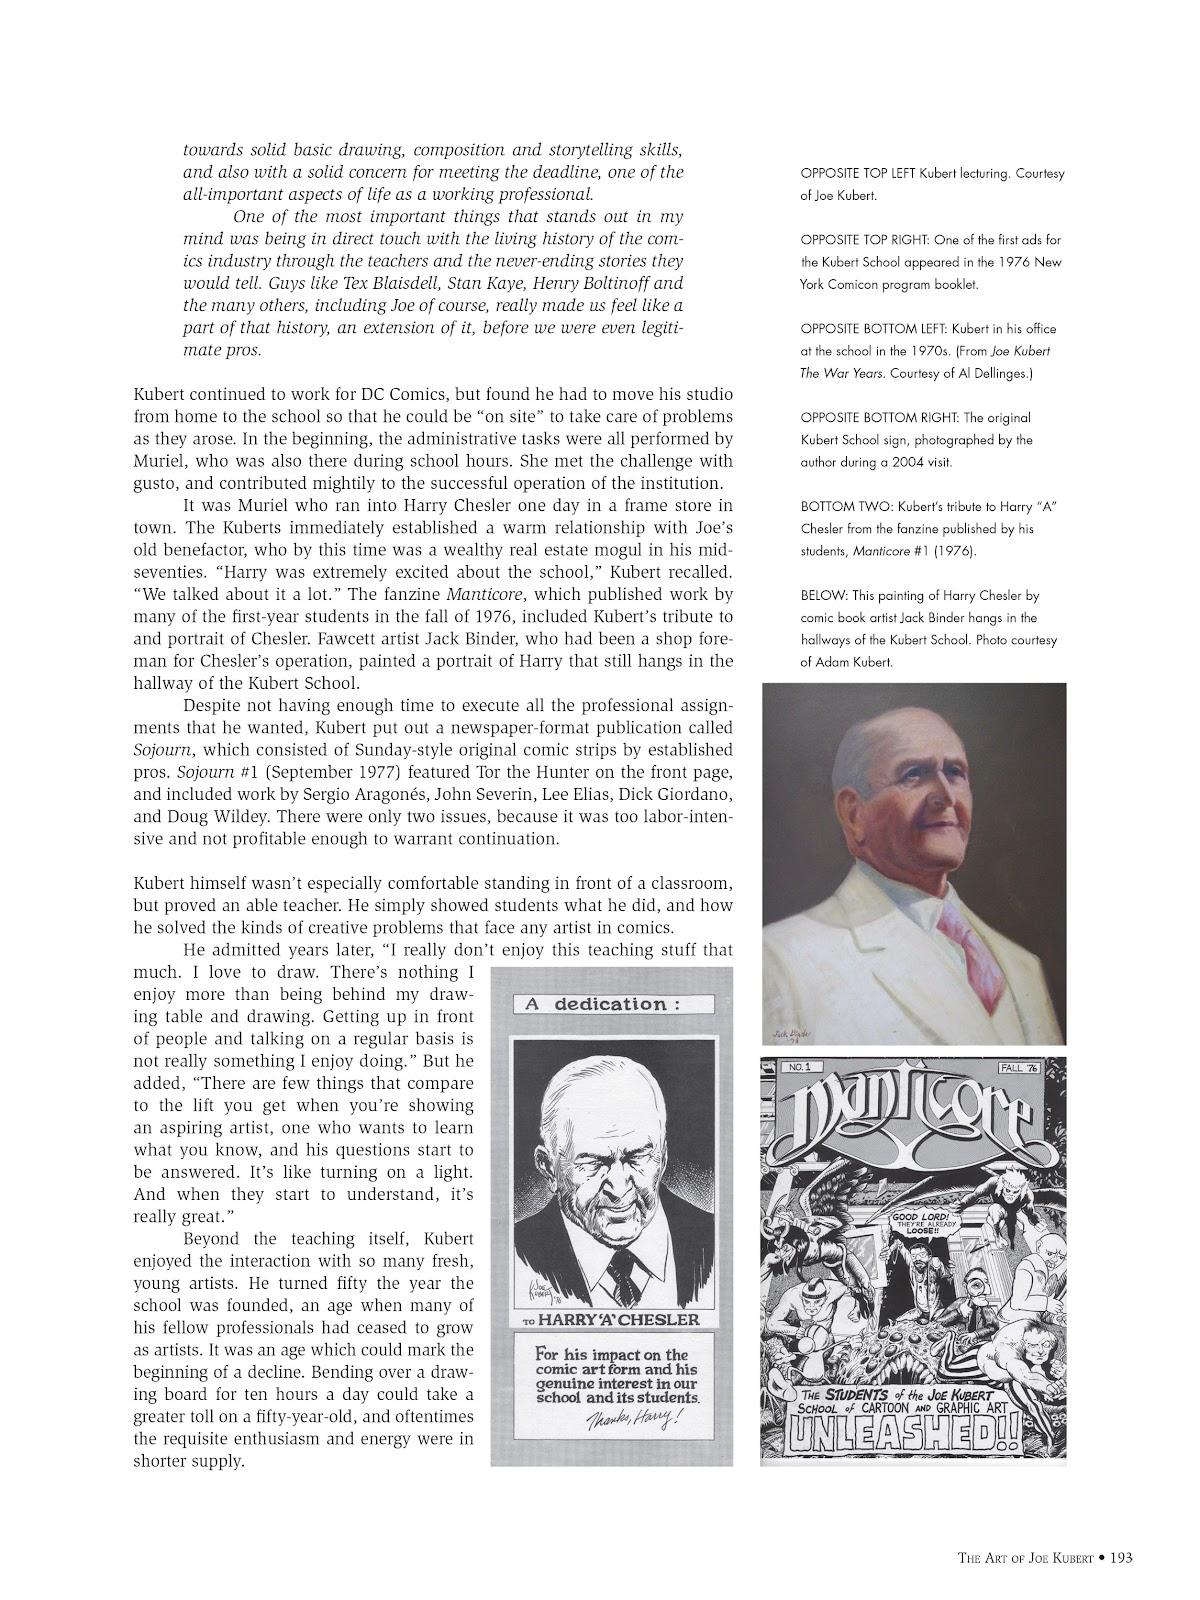 Read online The Art of Joe Kubert comic -  Issue # TPB (Part 2) - 93